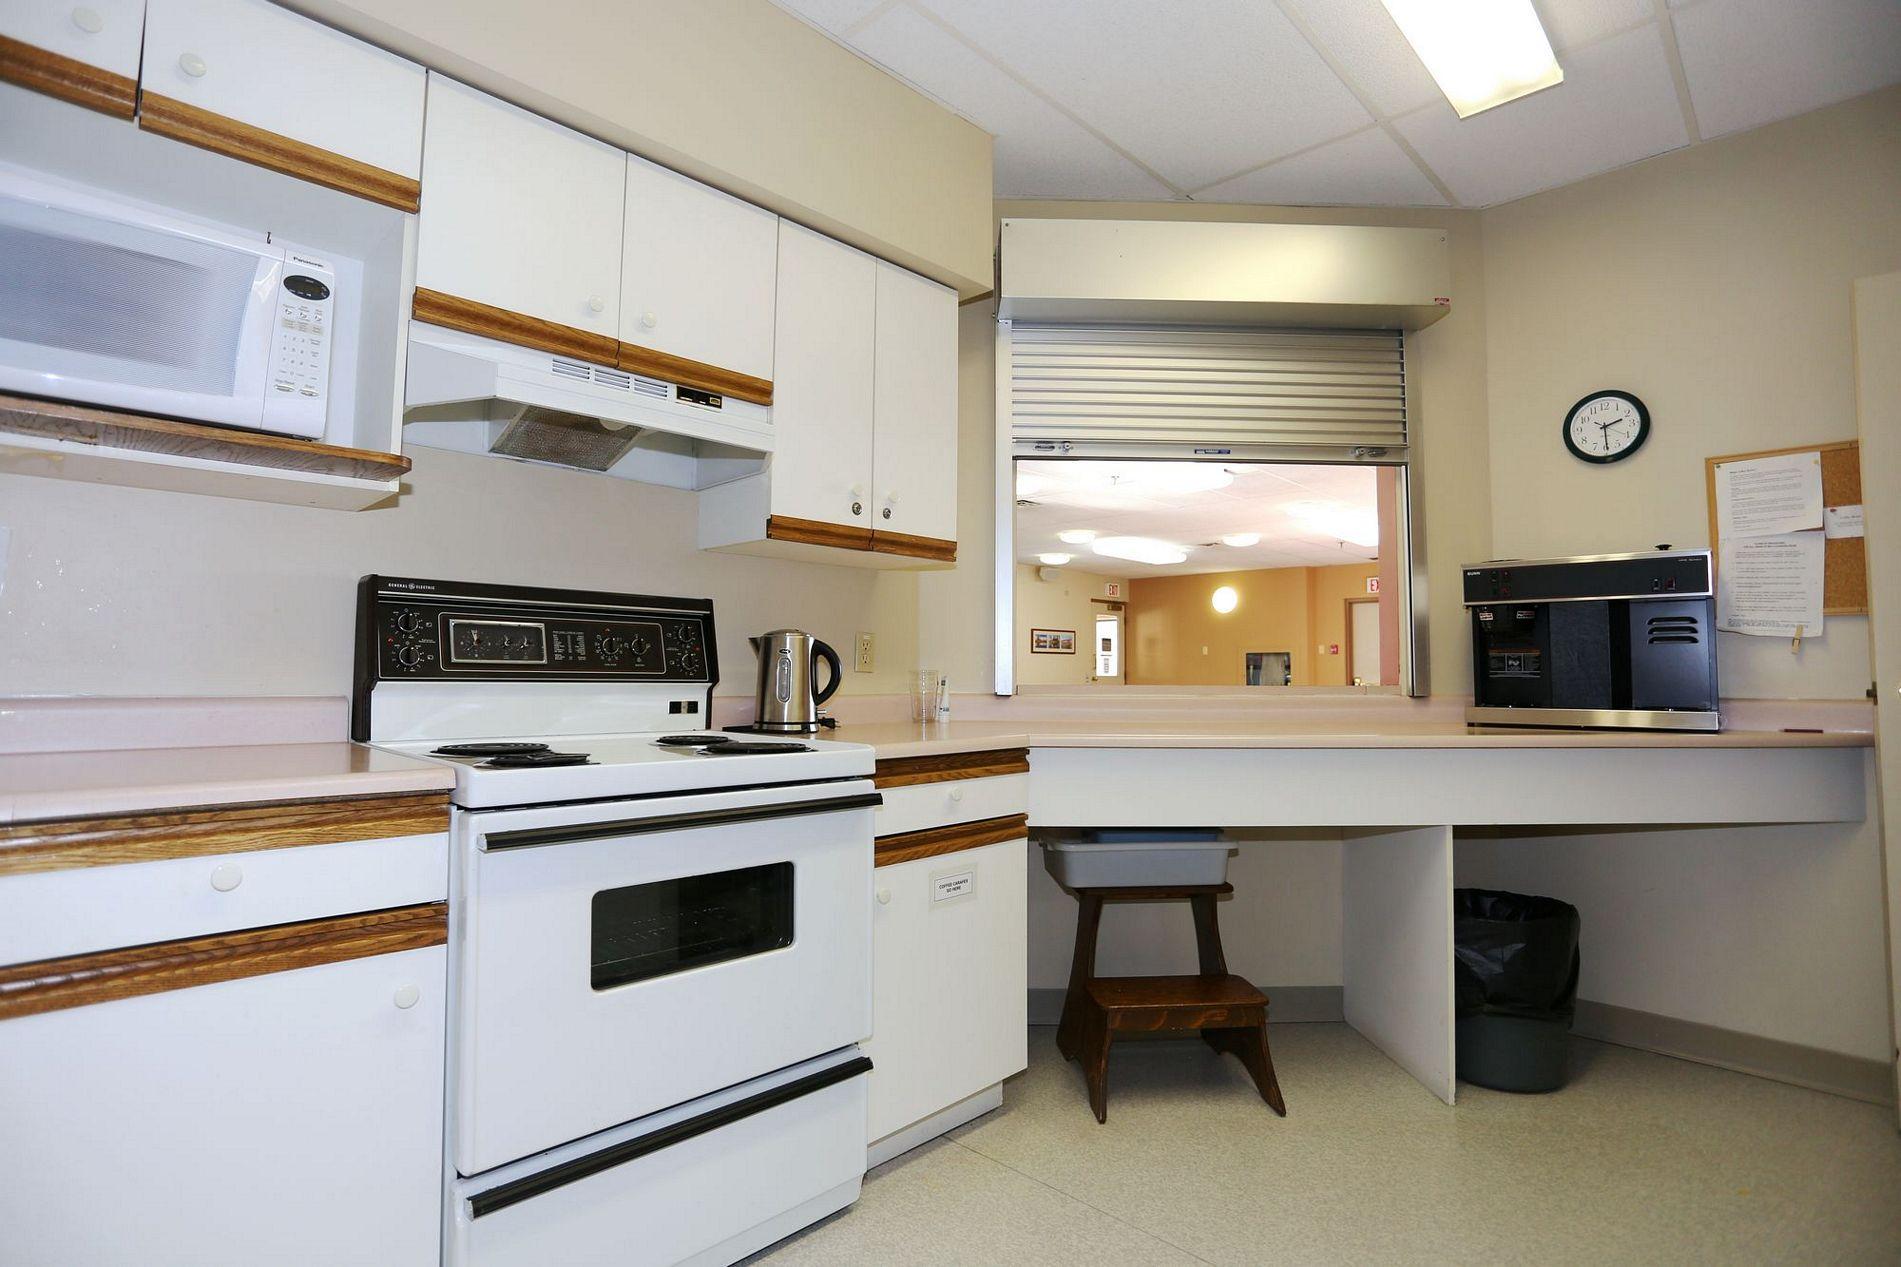 307-885 Wilkes Avenue, Winnipeg, Manitoba  R3P 1J3 - Photo 26 - 1504750